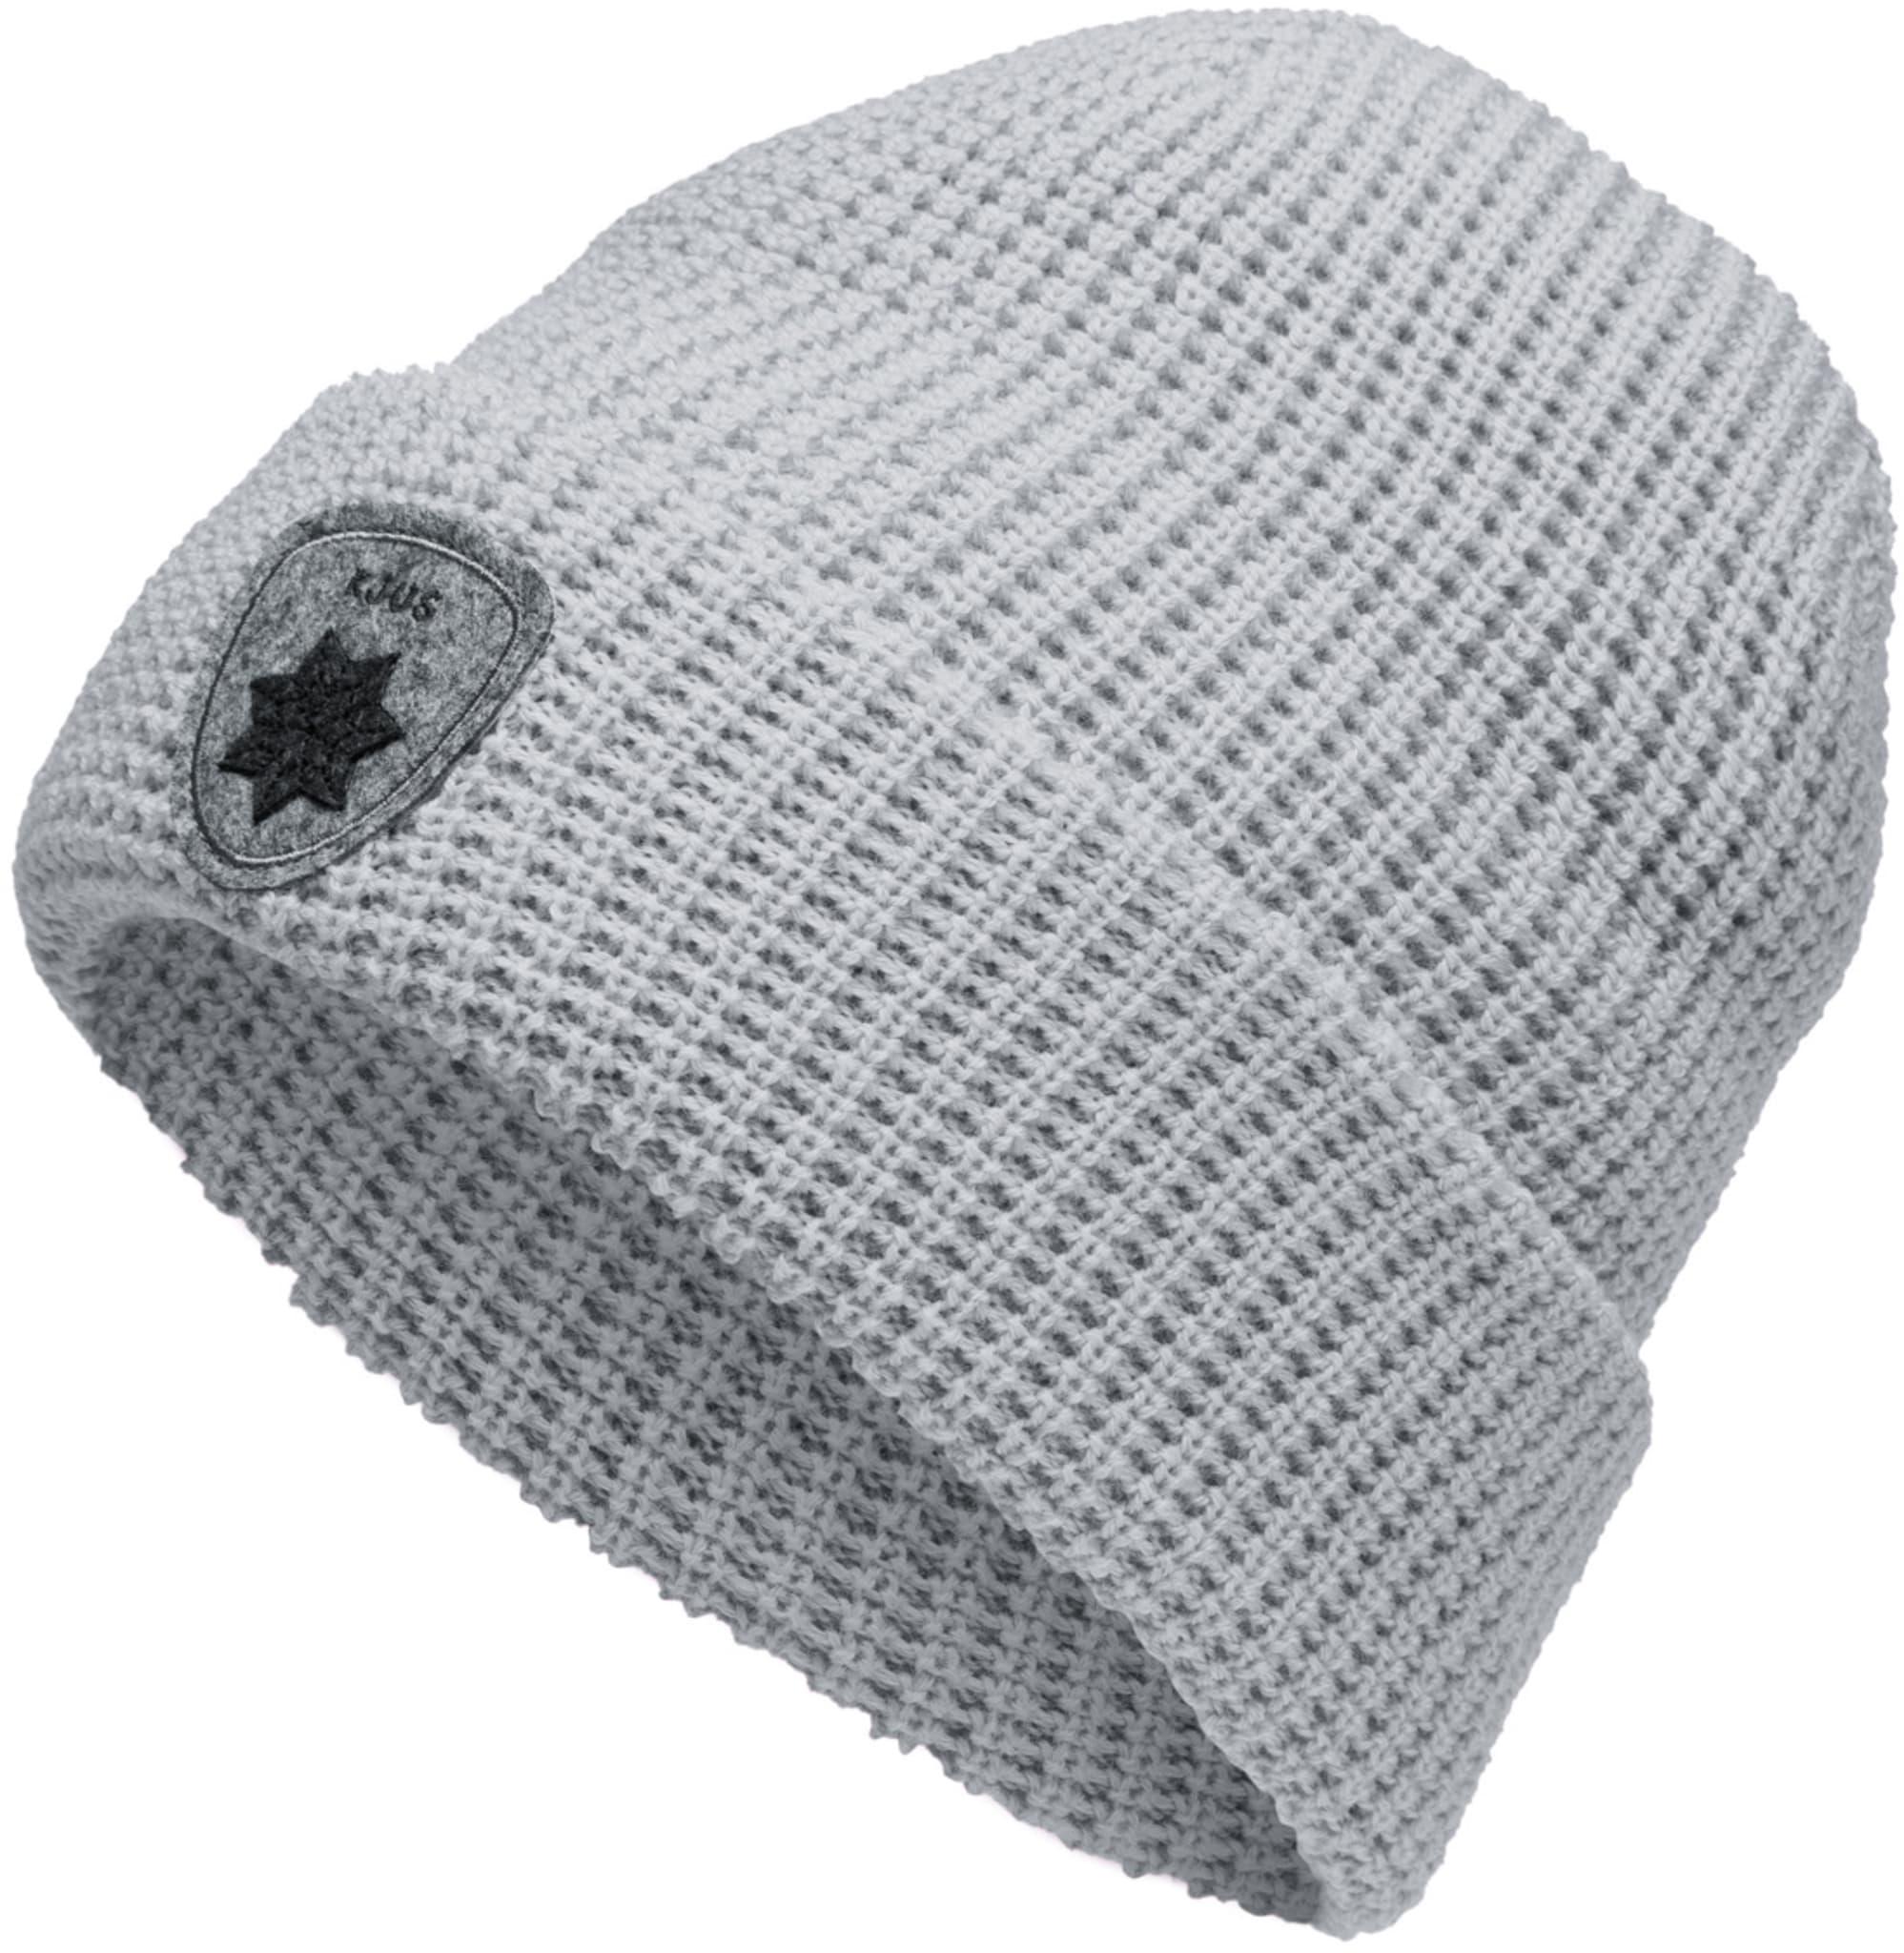 Knit Beanie Women